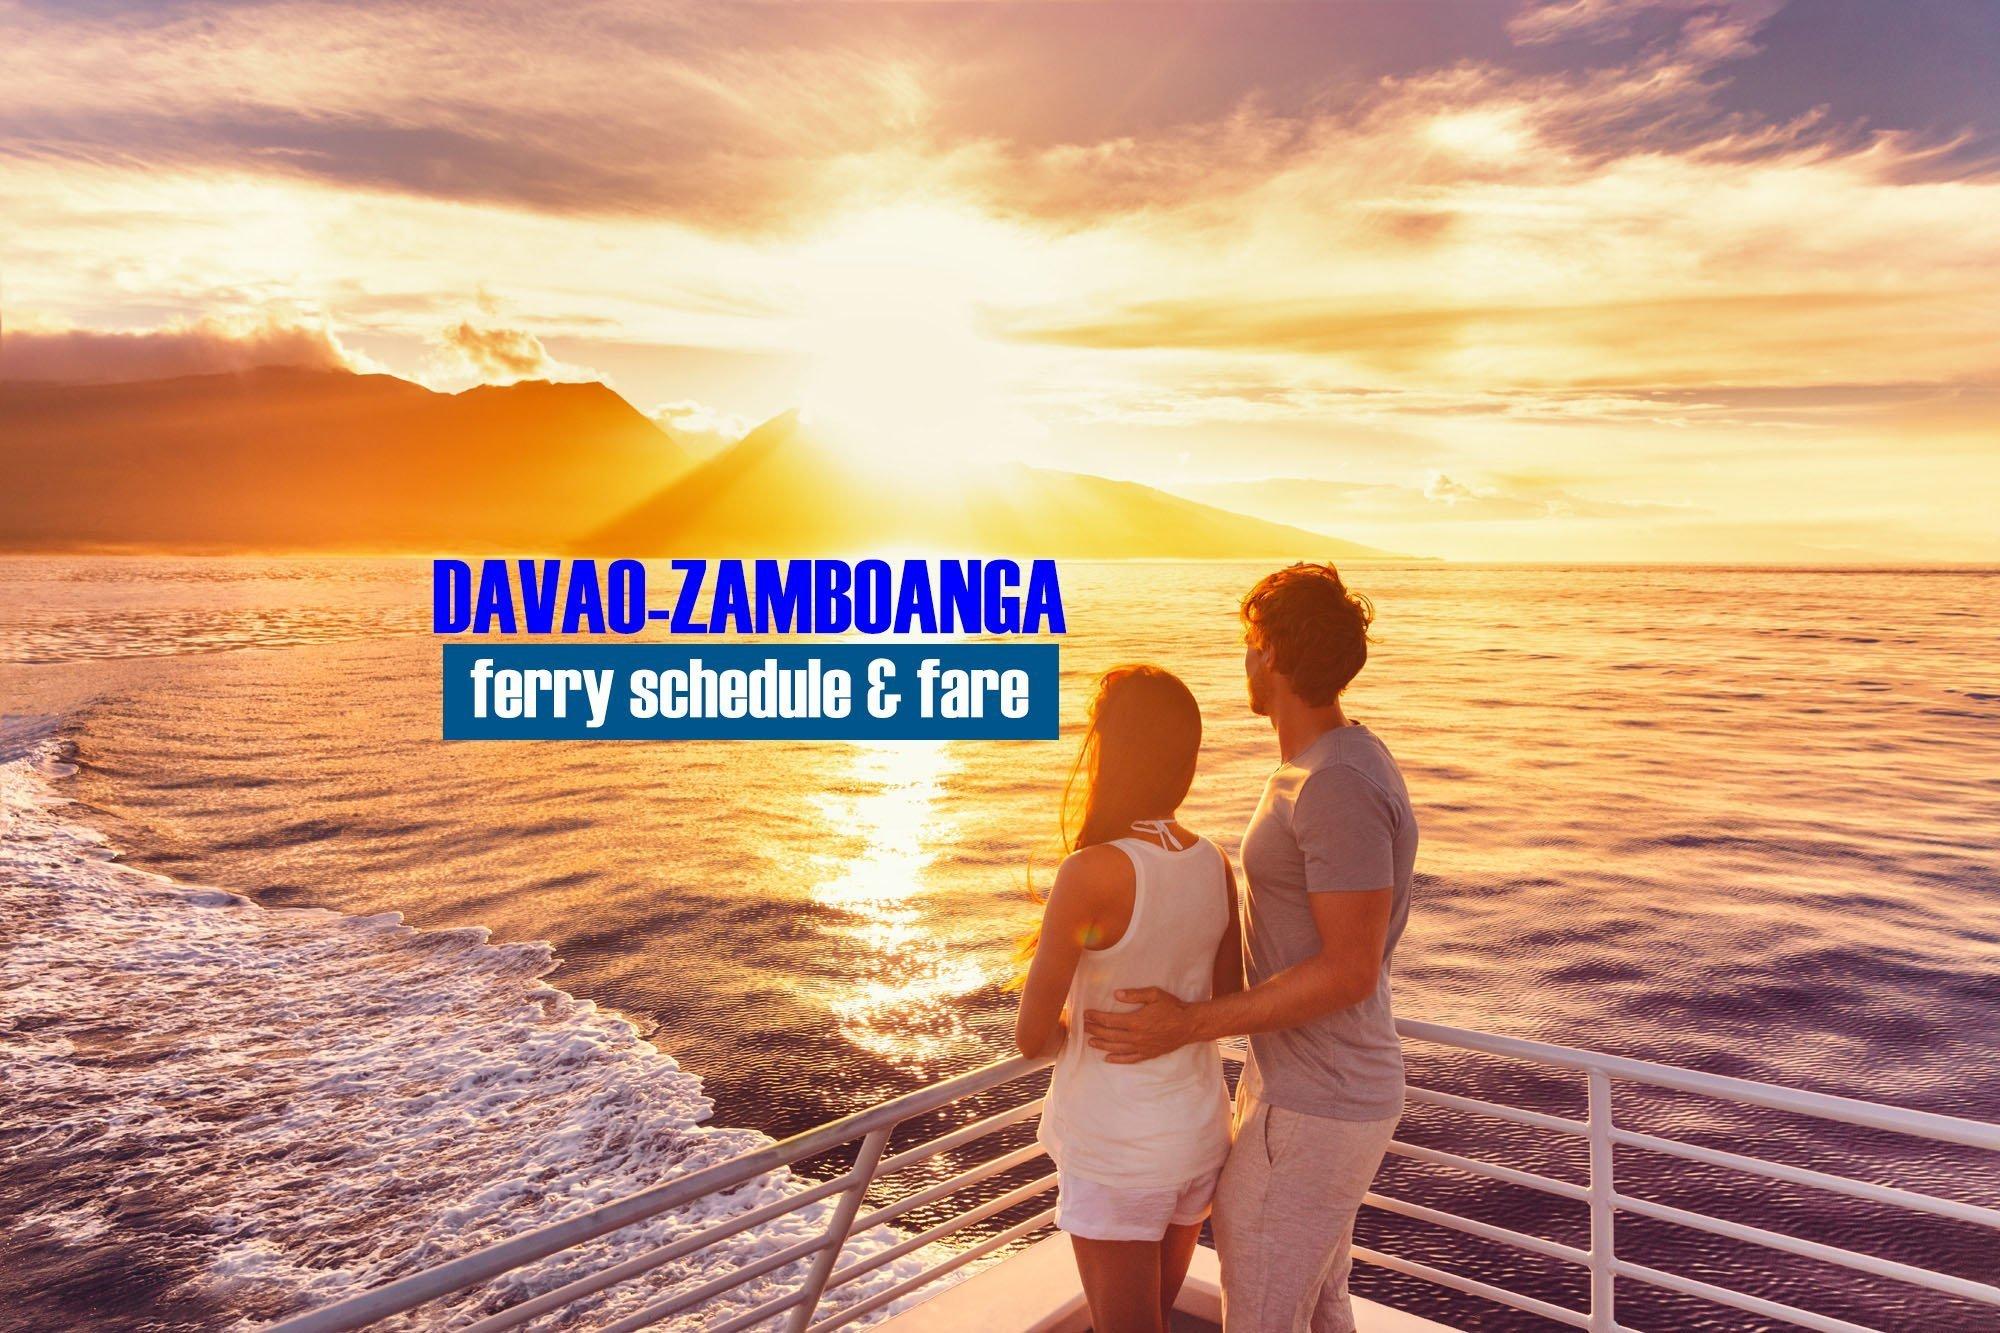 Davao to Zamboanga: 2019 Boat Schedule and Fare